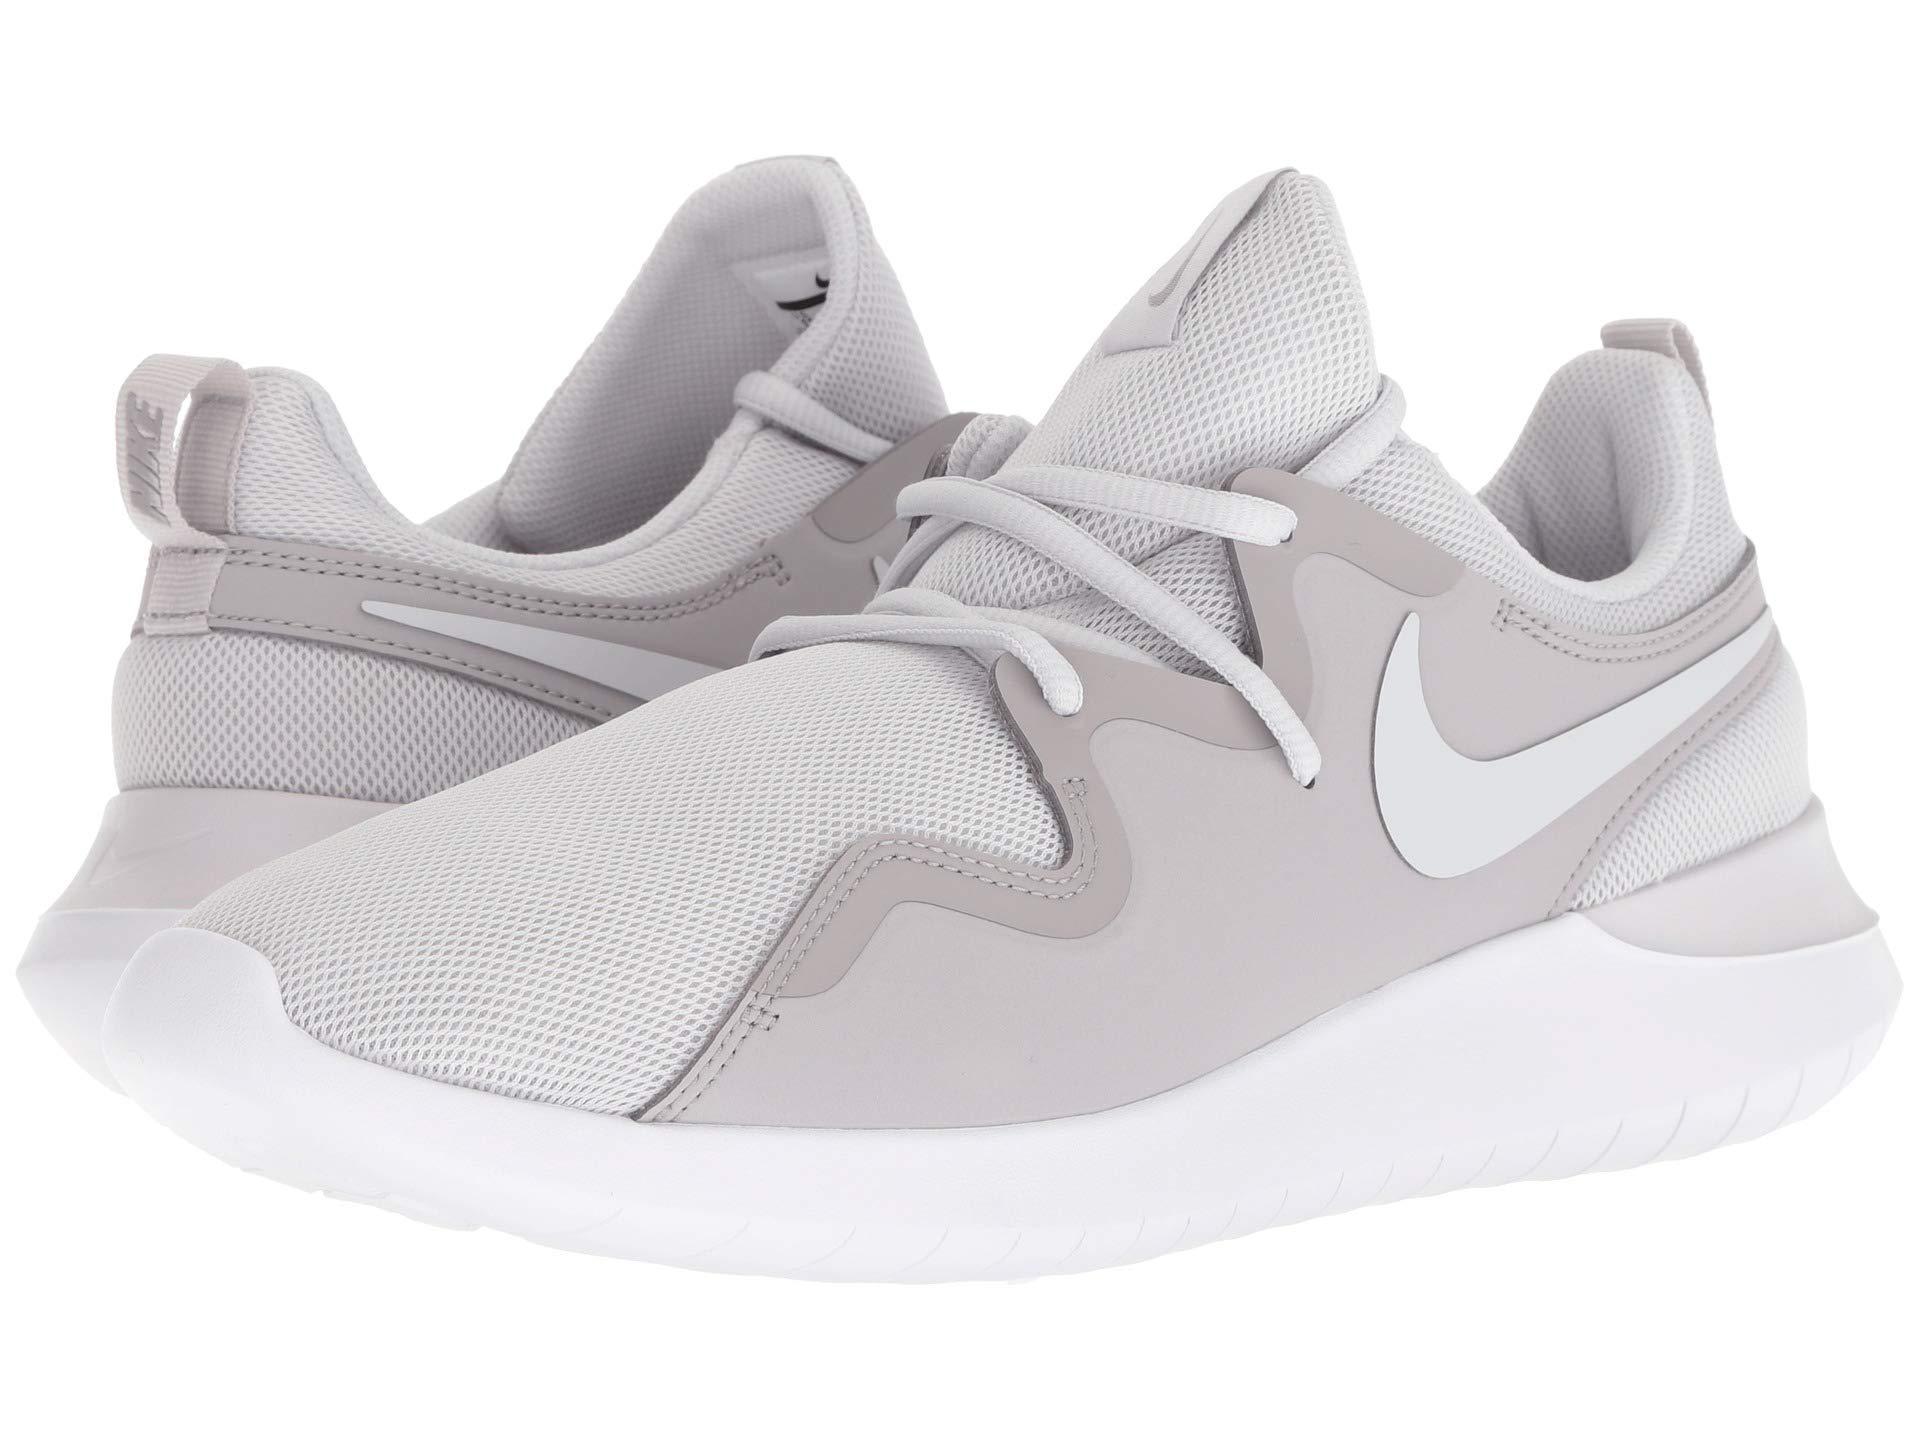 2d678aa2f8 Nike Tessen (vast Grey/vast Grey/atmosphere Grey) Men's Running ...